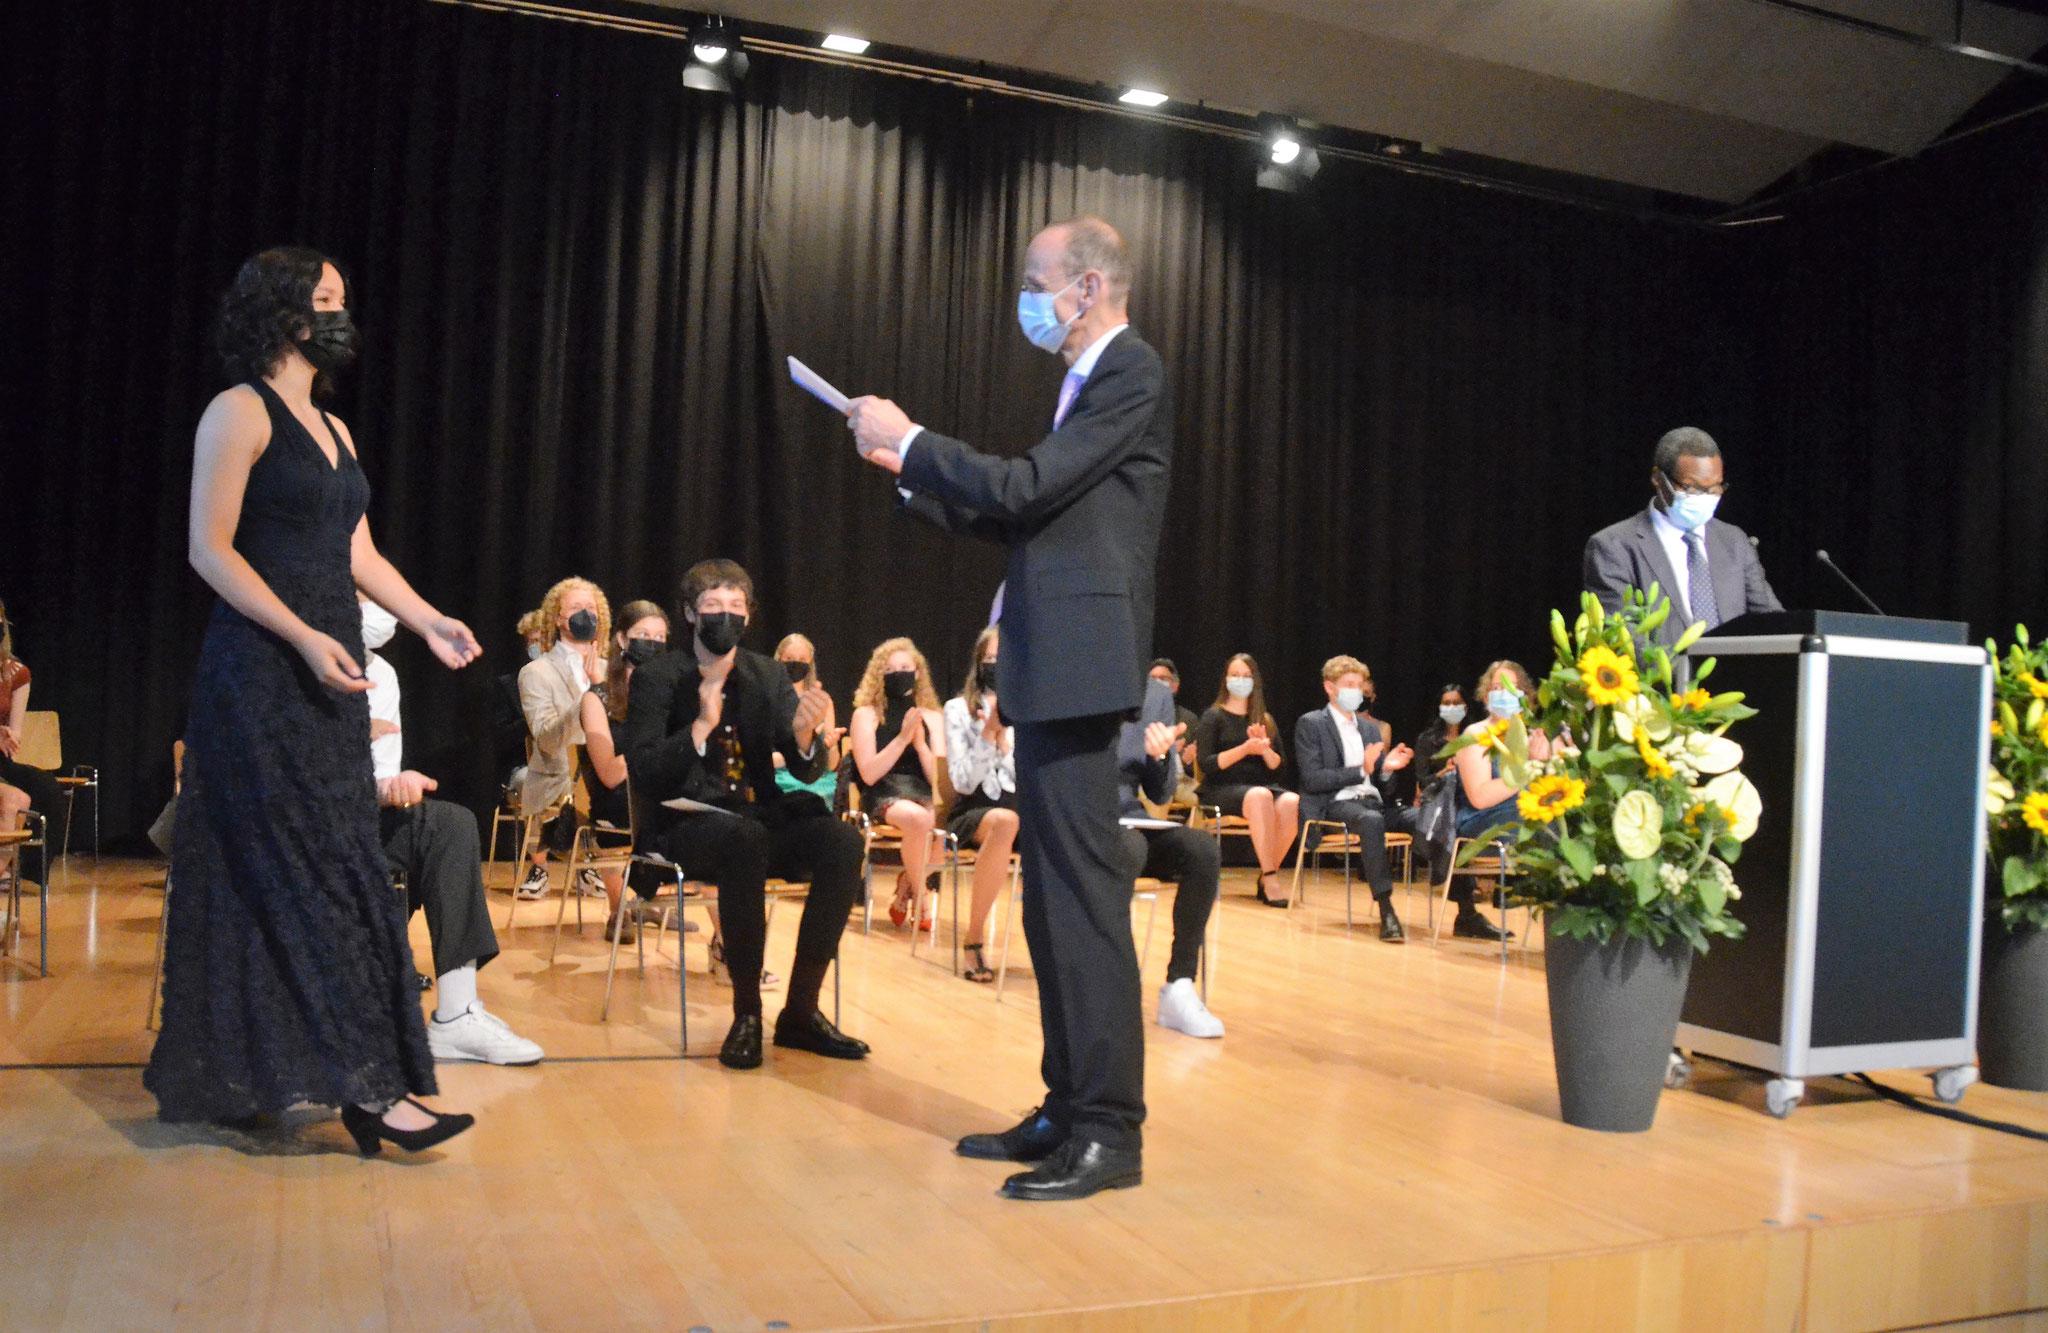 Maturafeier an der Kantonsschule Alpenquai am 22. Juni 2021: Zeugnisübergabe durch Rektor Hans Hirschi. Foto Benno Bühlmann